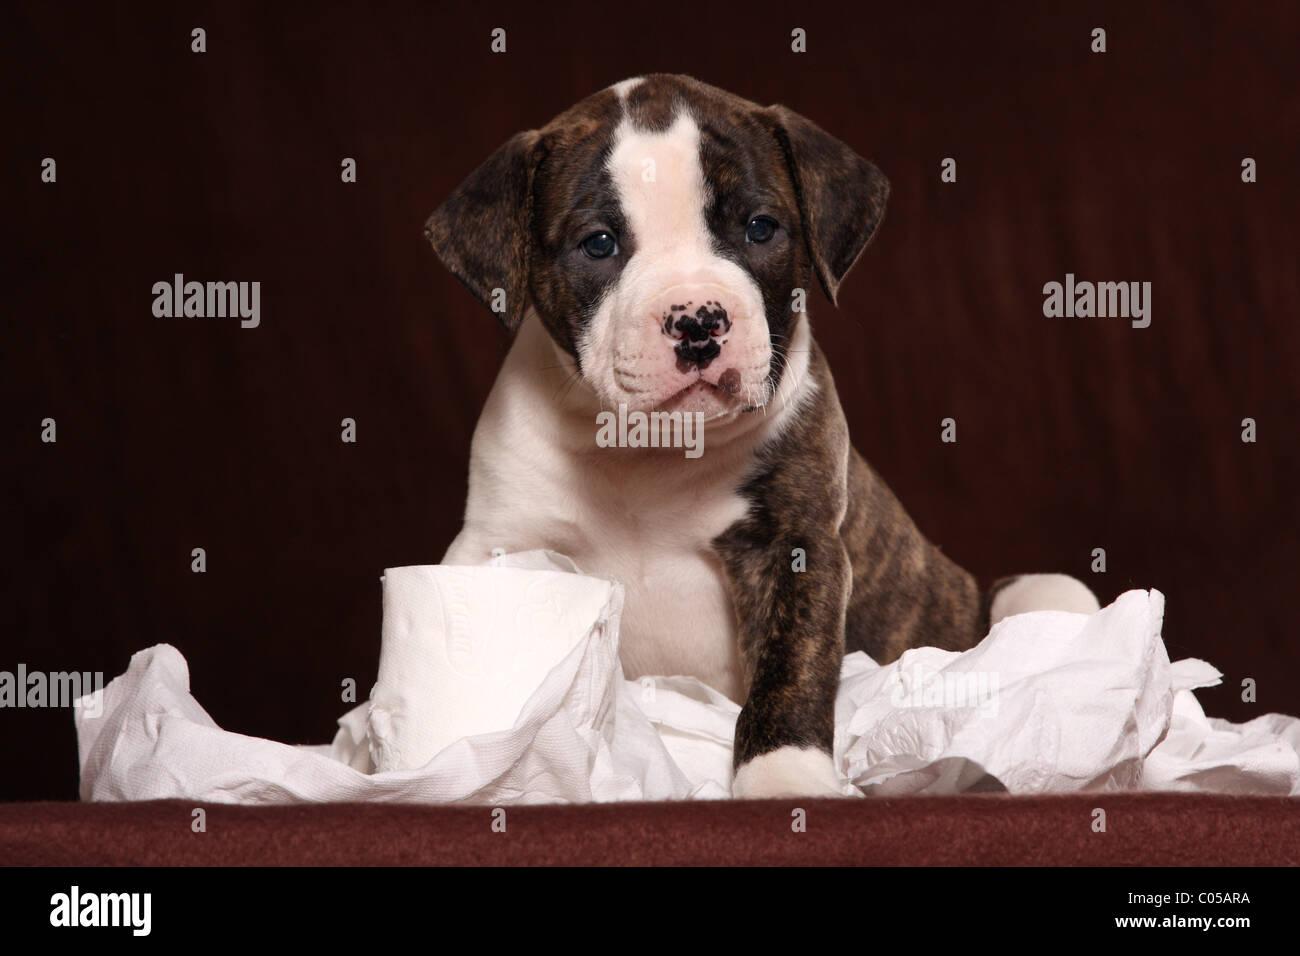 American Bulldog Puppy - Stock Image